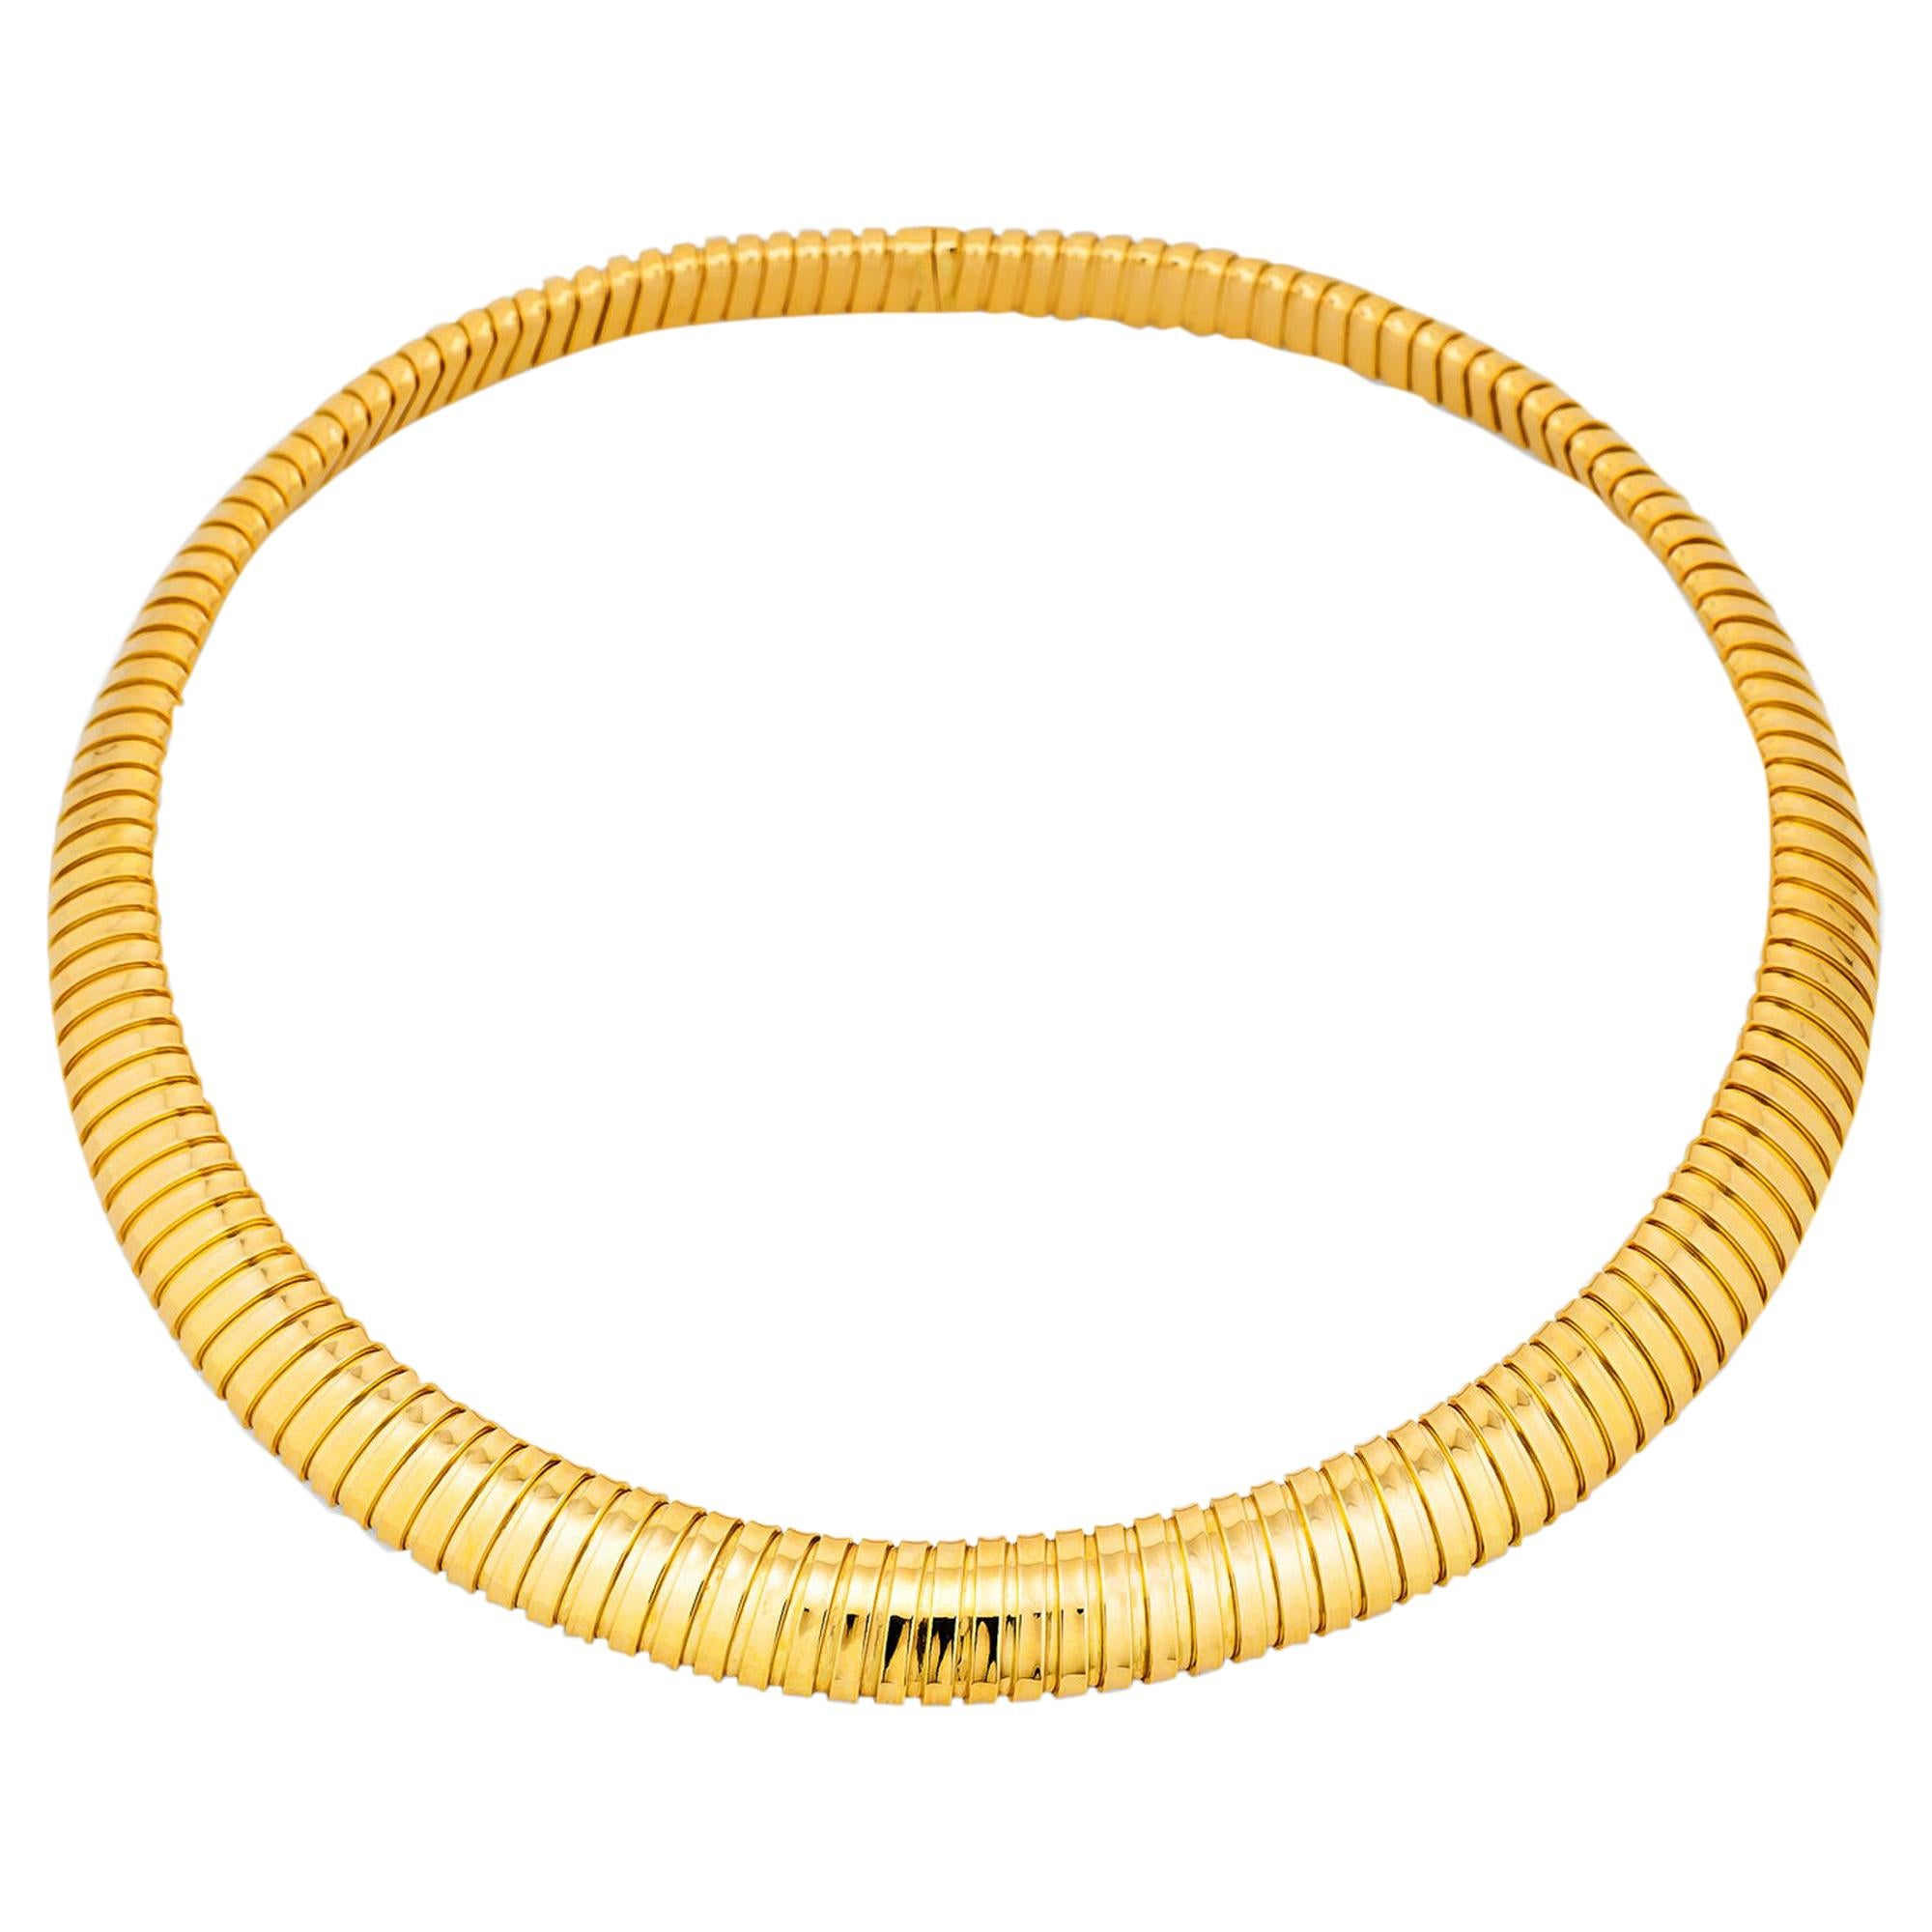 Gold Tubogas Choker Necklace